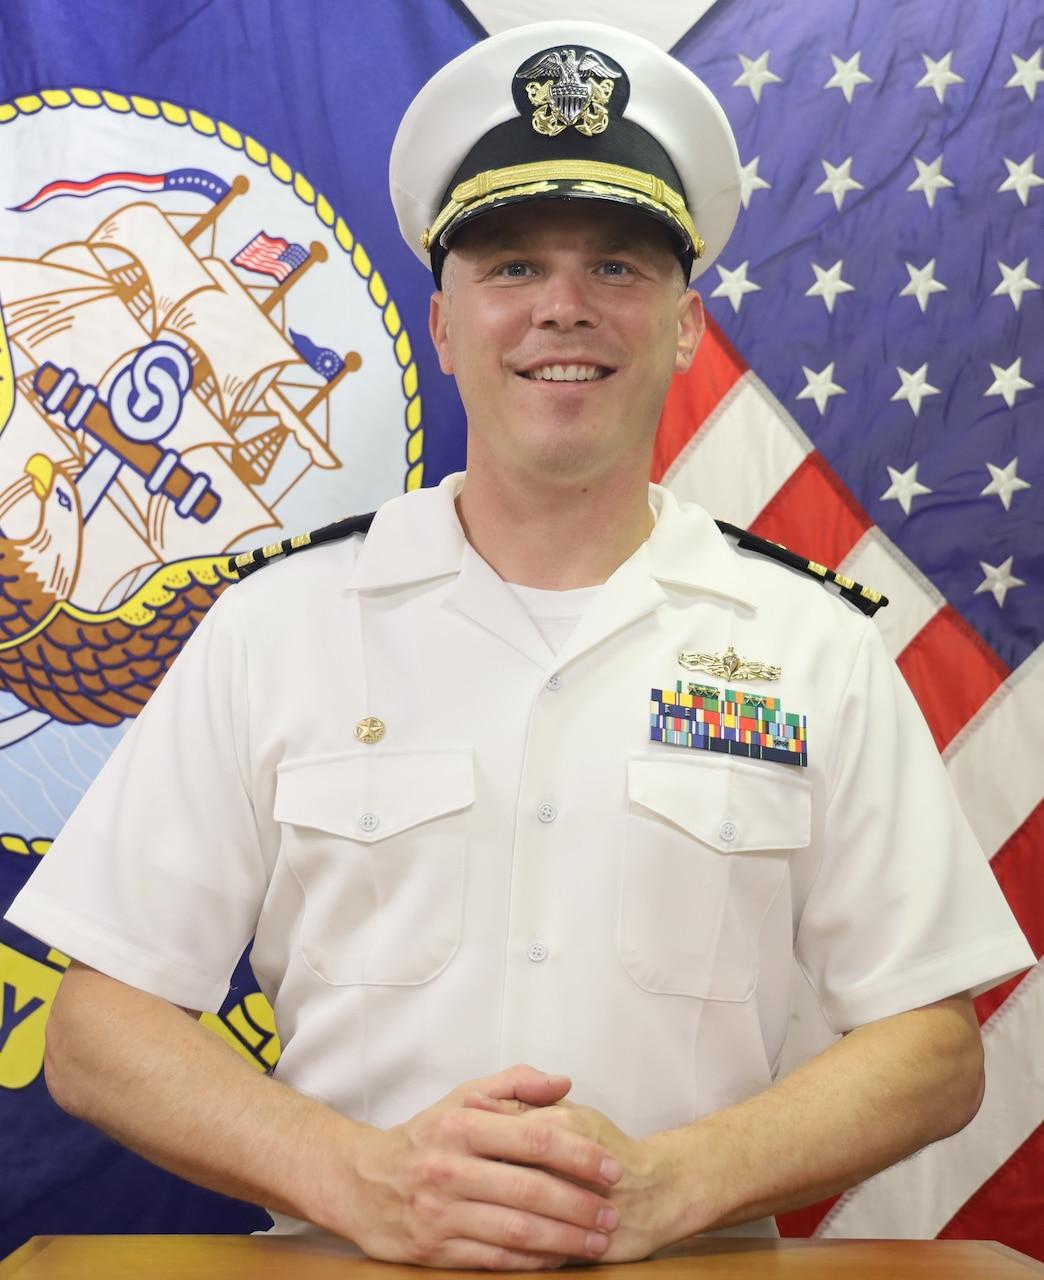 Commander Jason Lautar